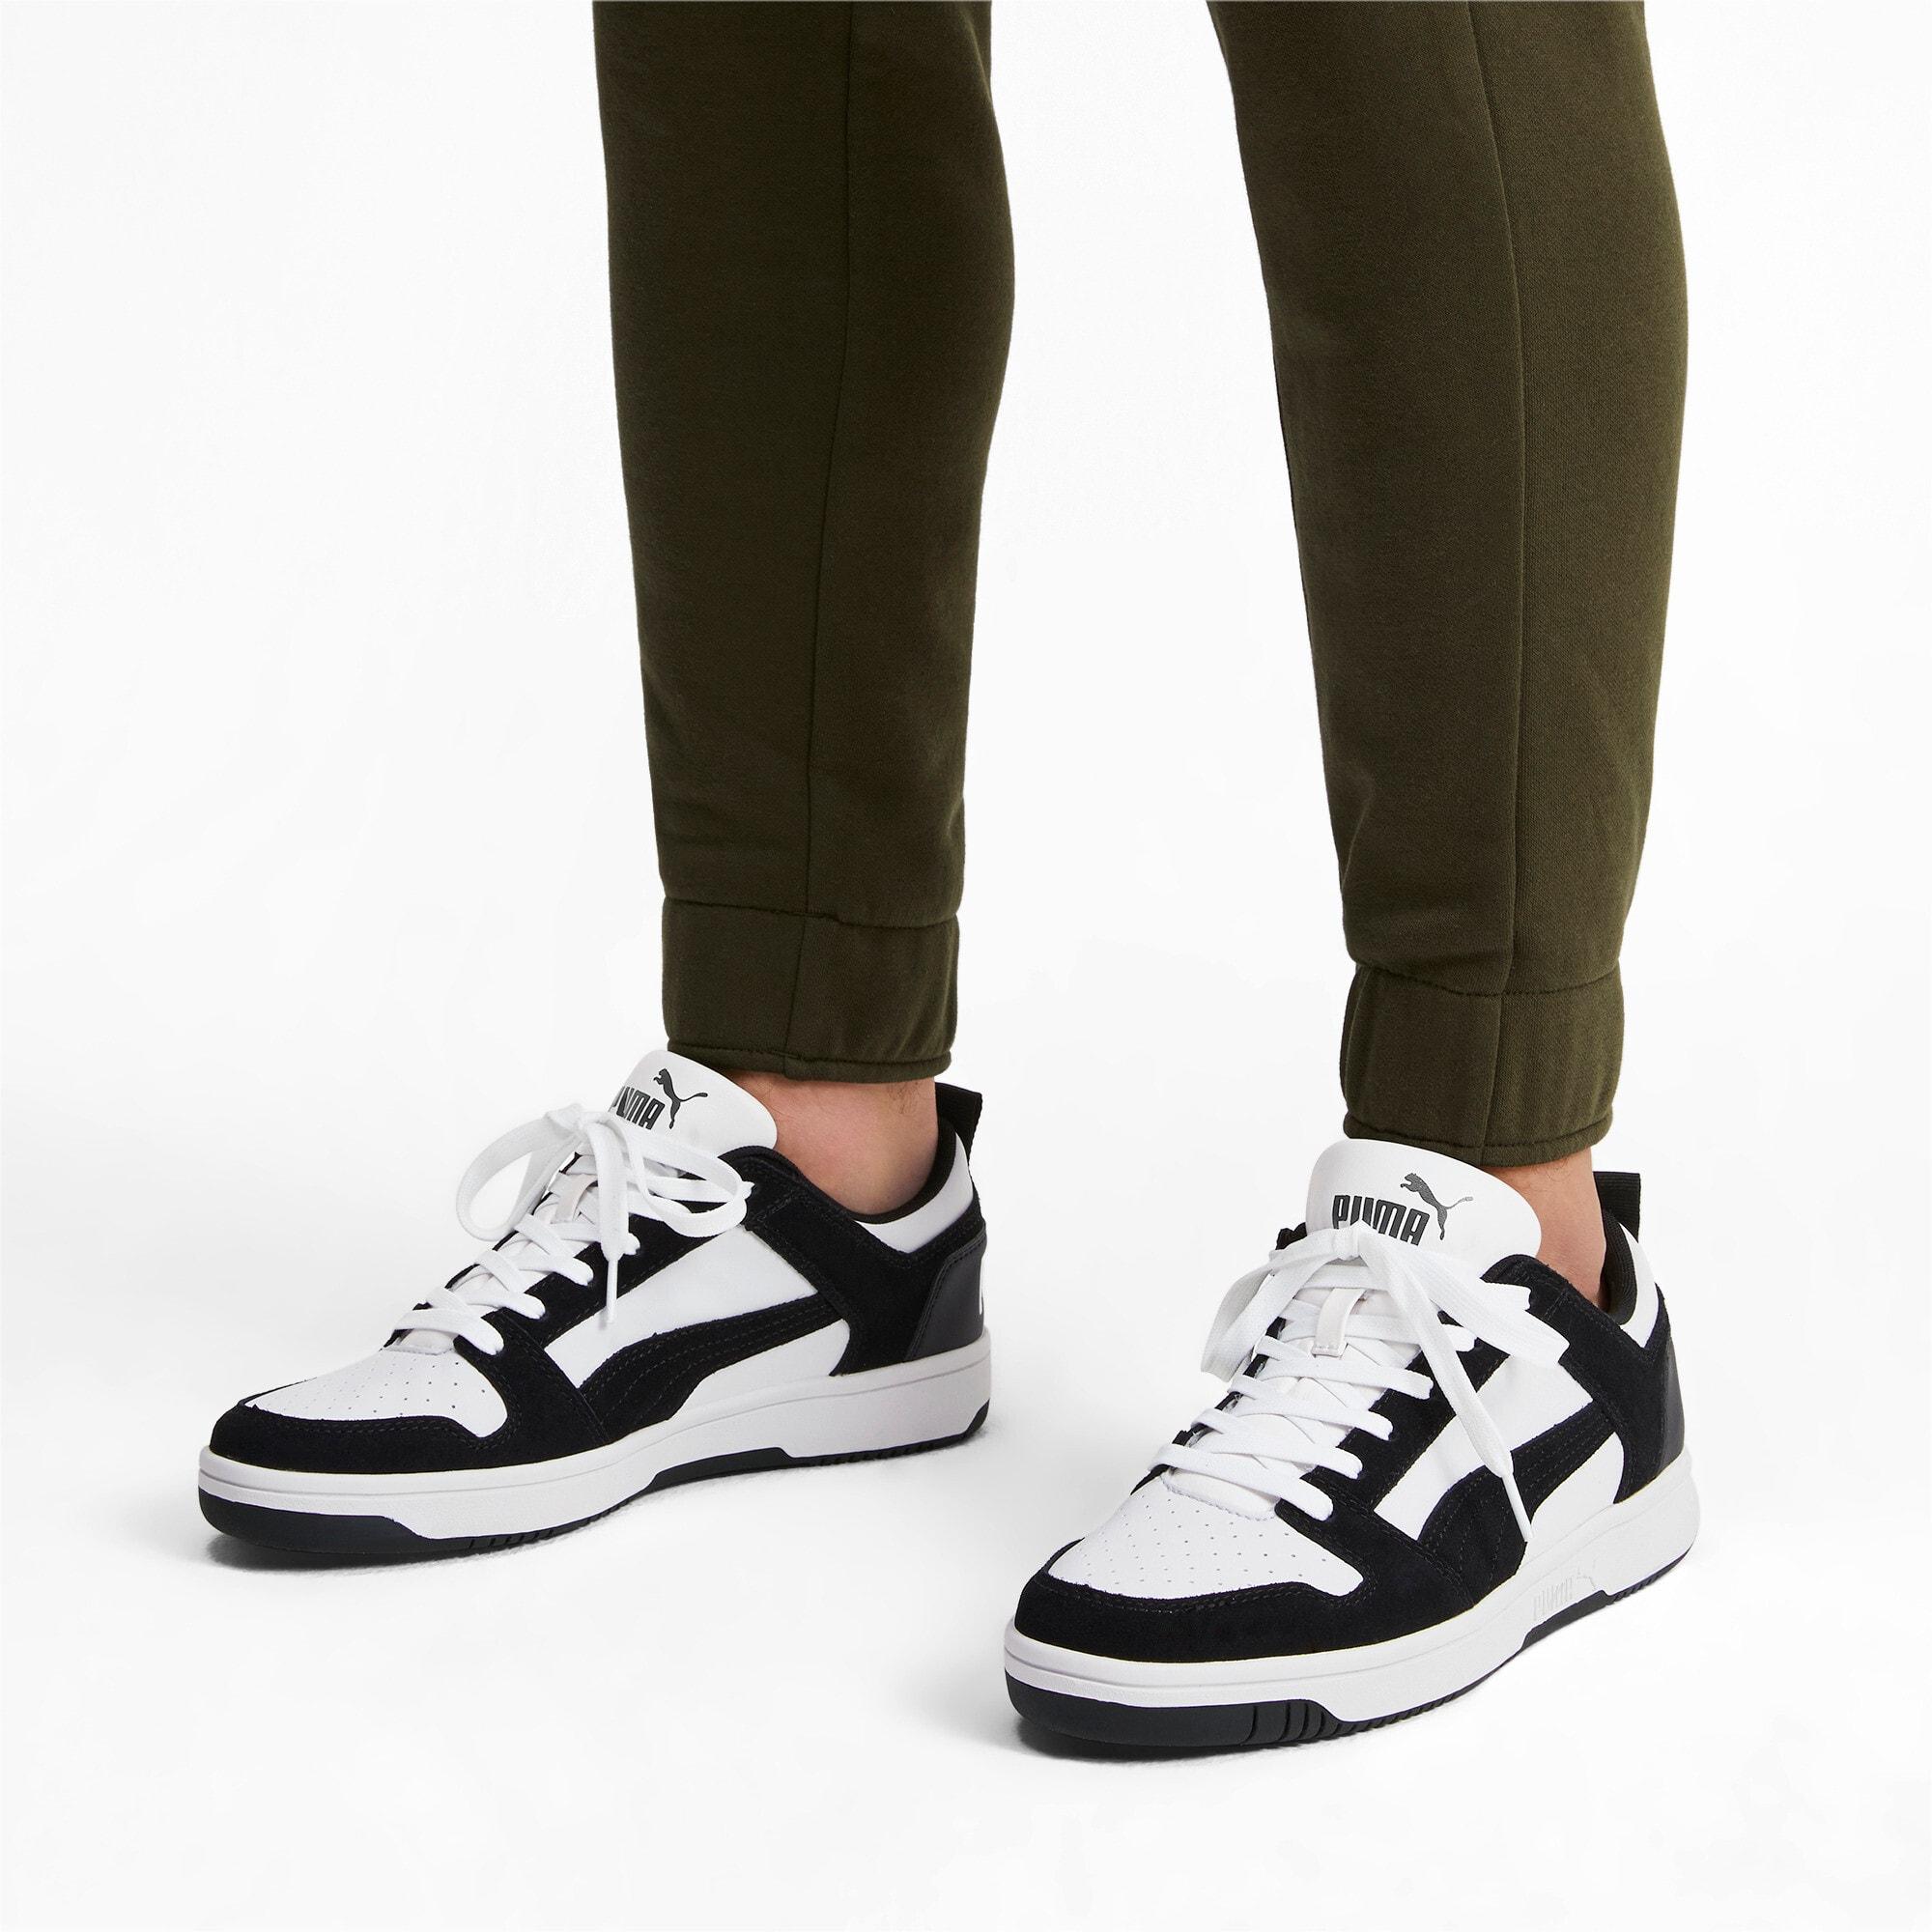 Miniatura 3 de Zapatos deportivos de gamuza PUMA Rebound LayUpLo, Puma Black-Puma White, mediano